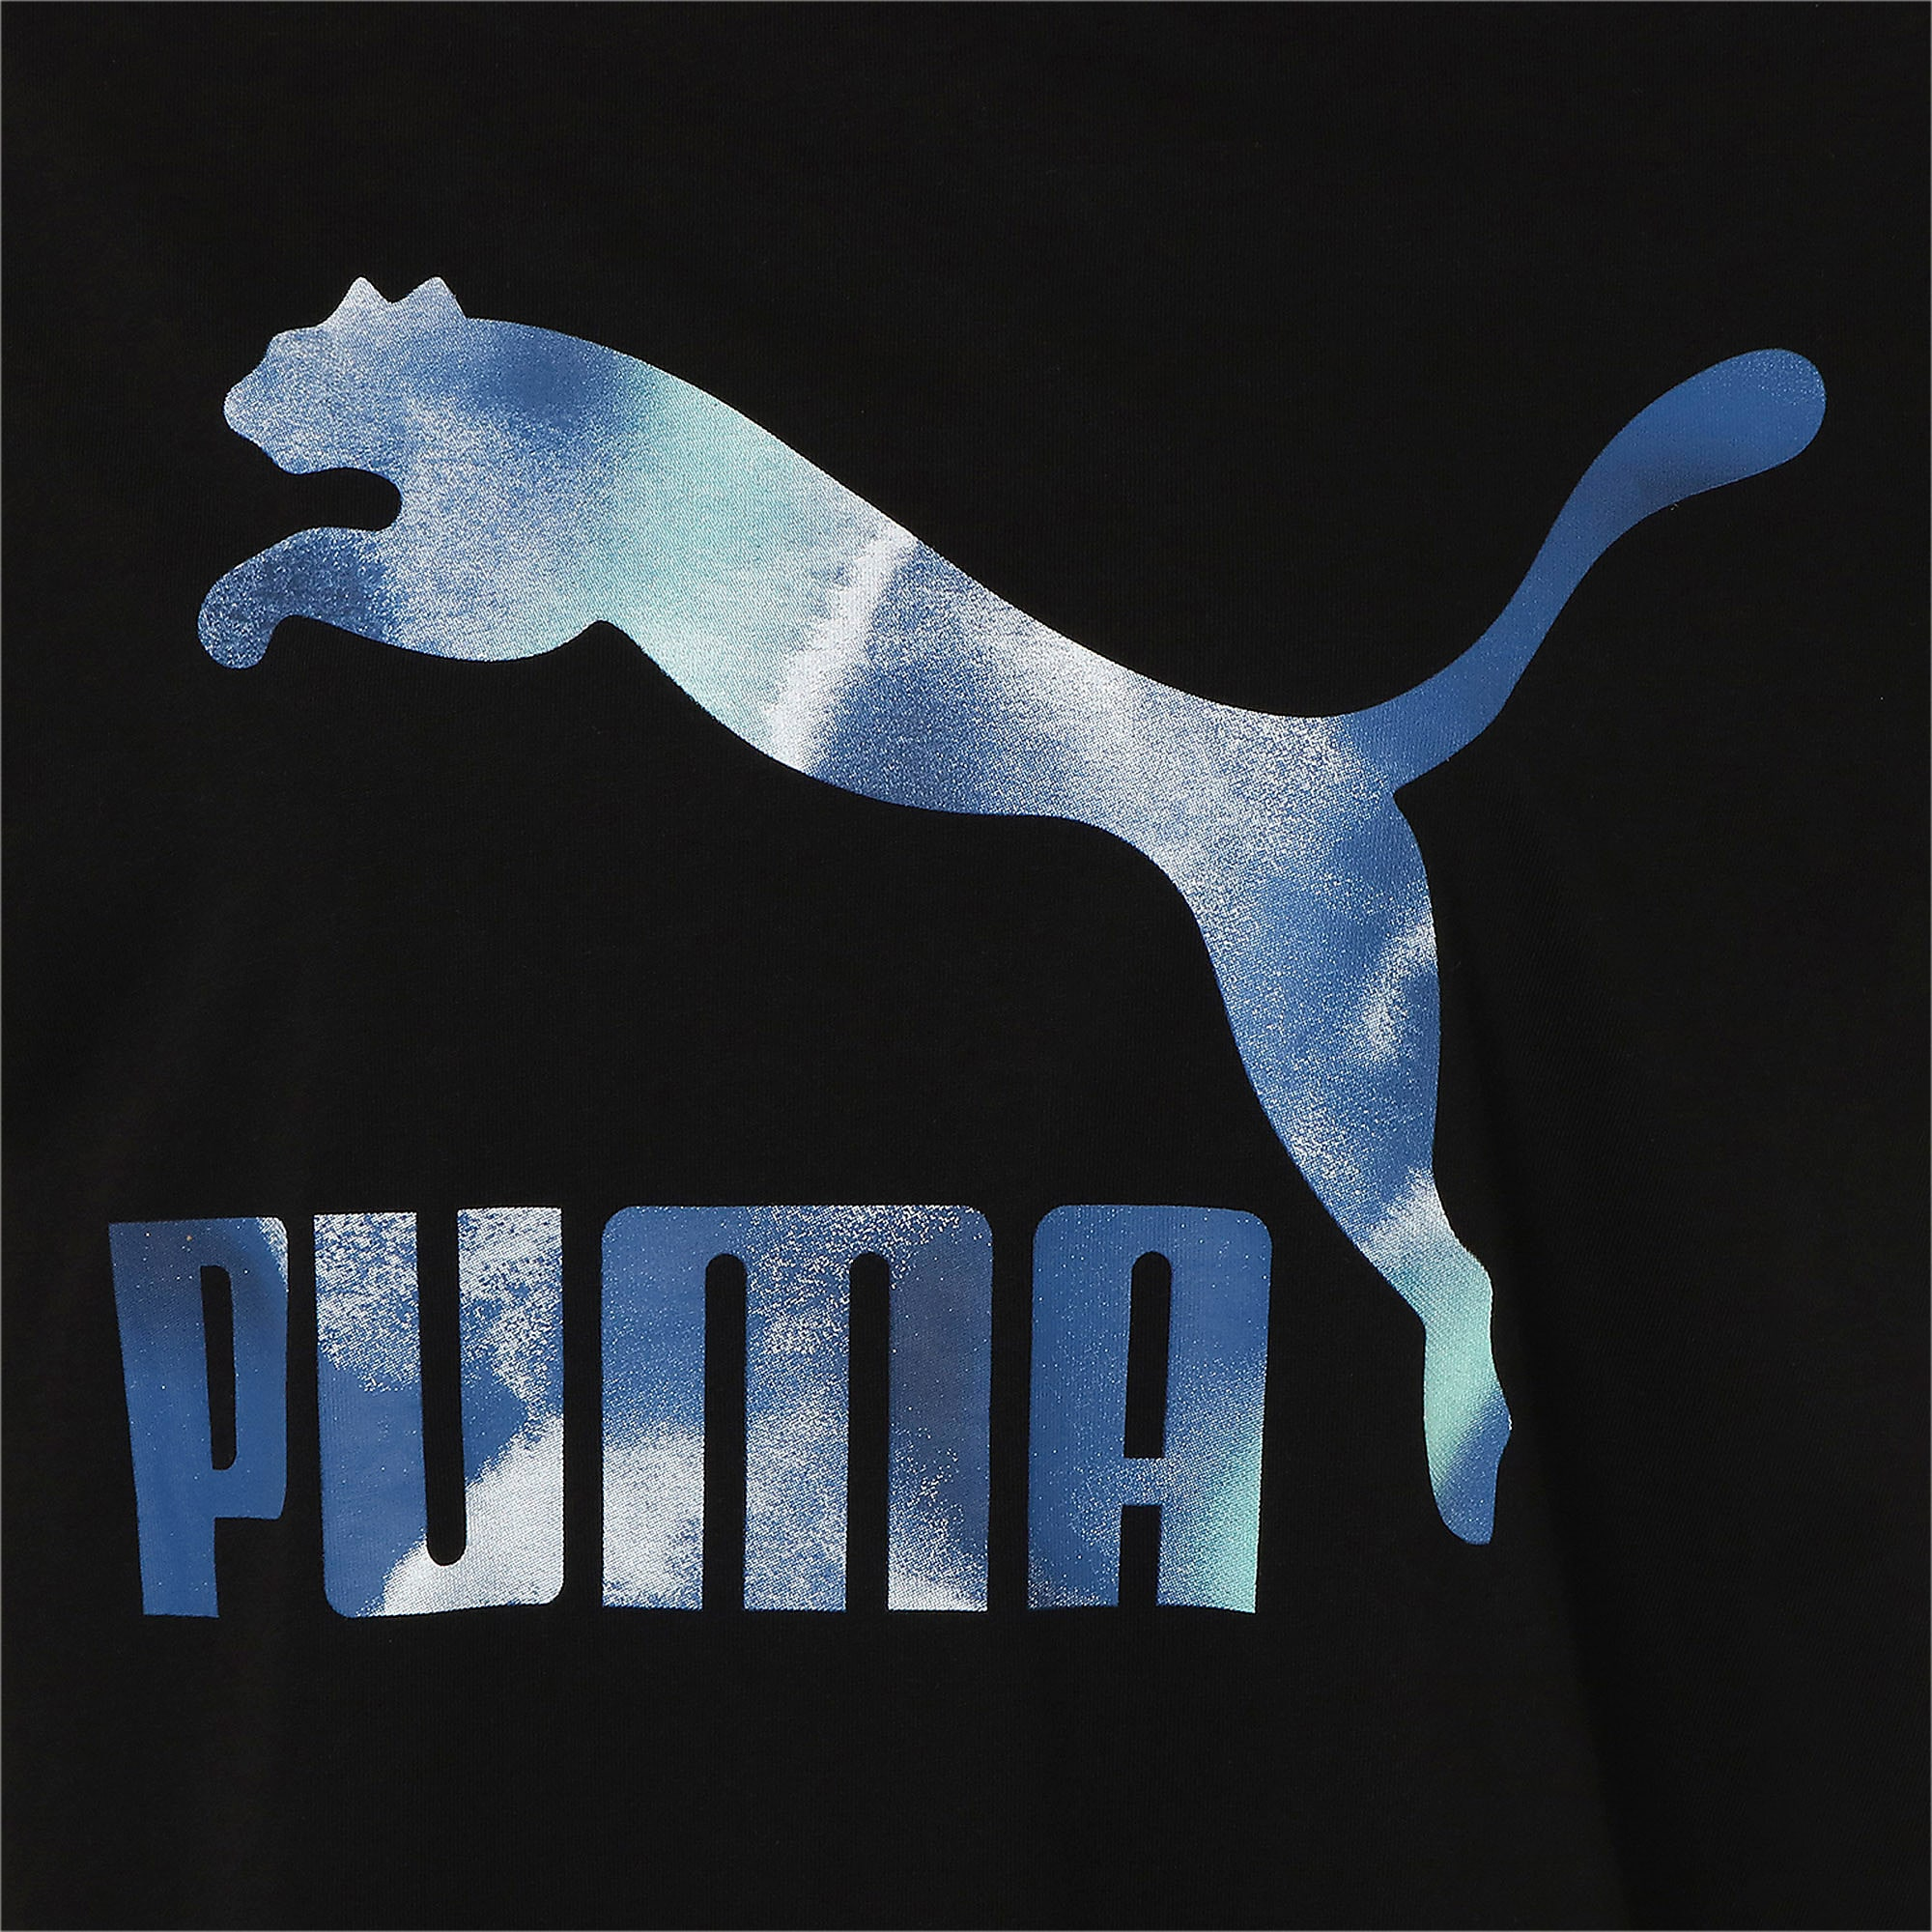 Thumbnail 4 of CLOUD パック ウィメンズ グラフィック Tシャツ, Puma Black, medium-JPN